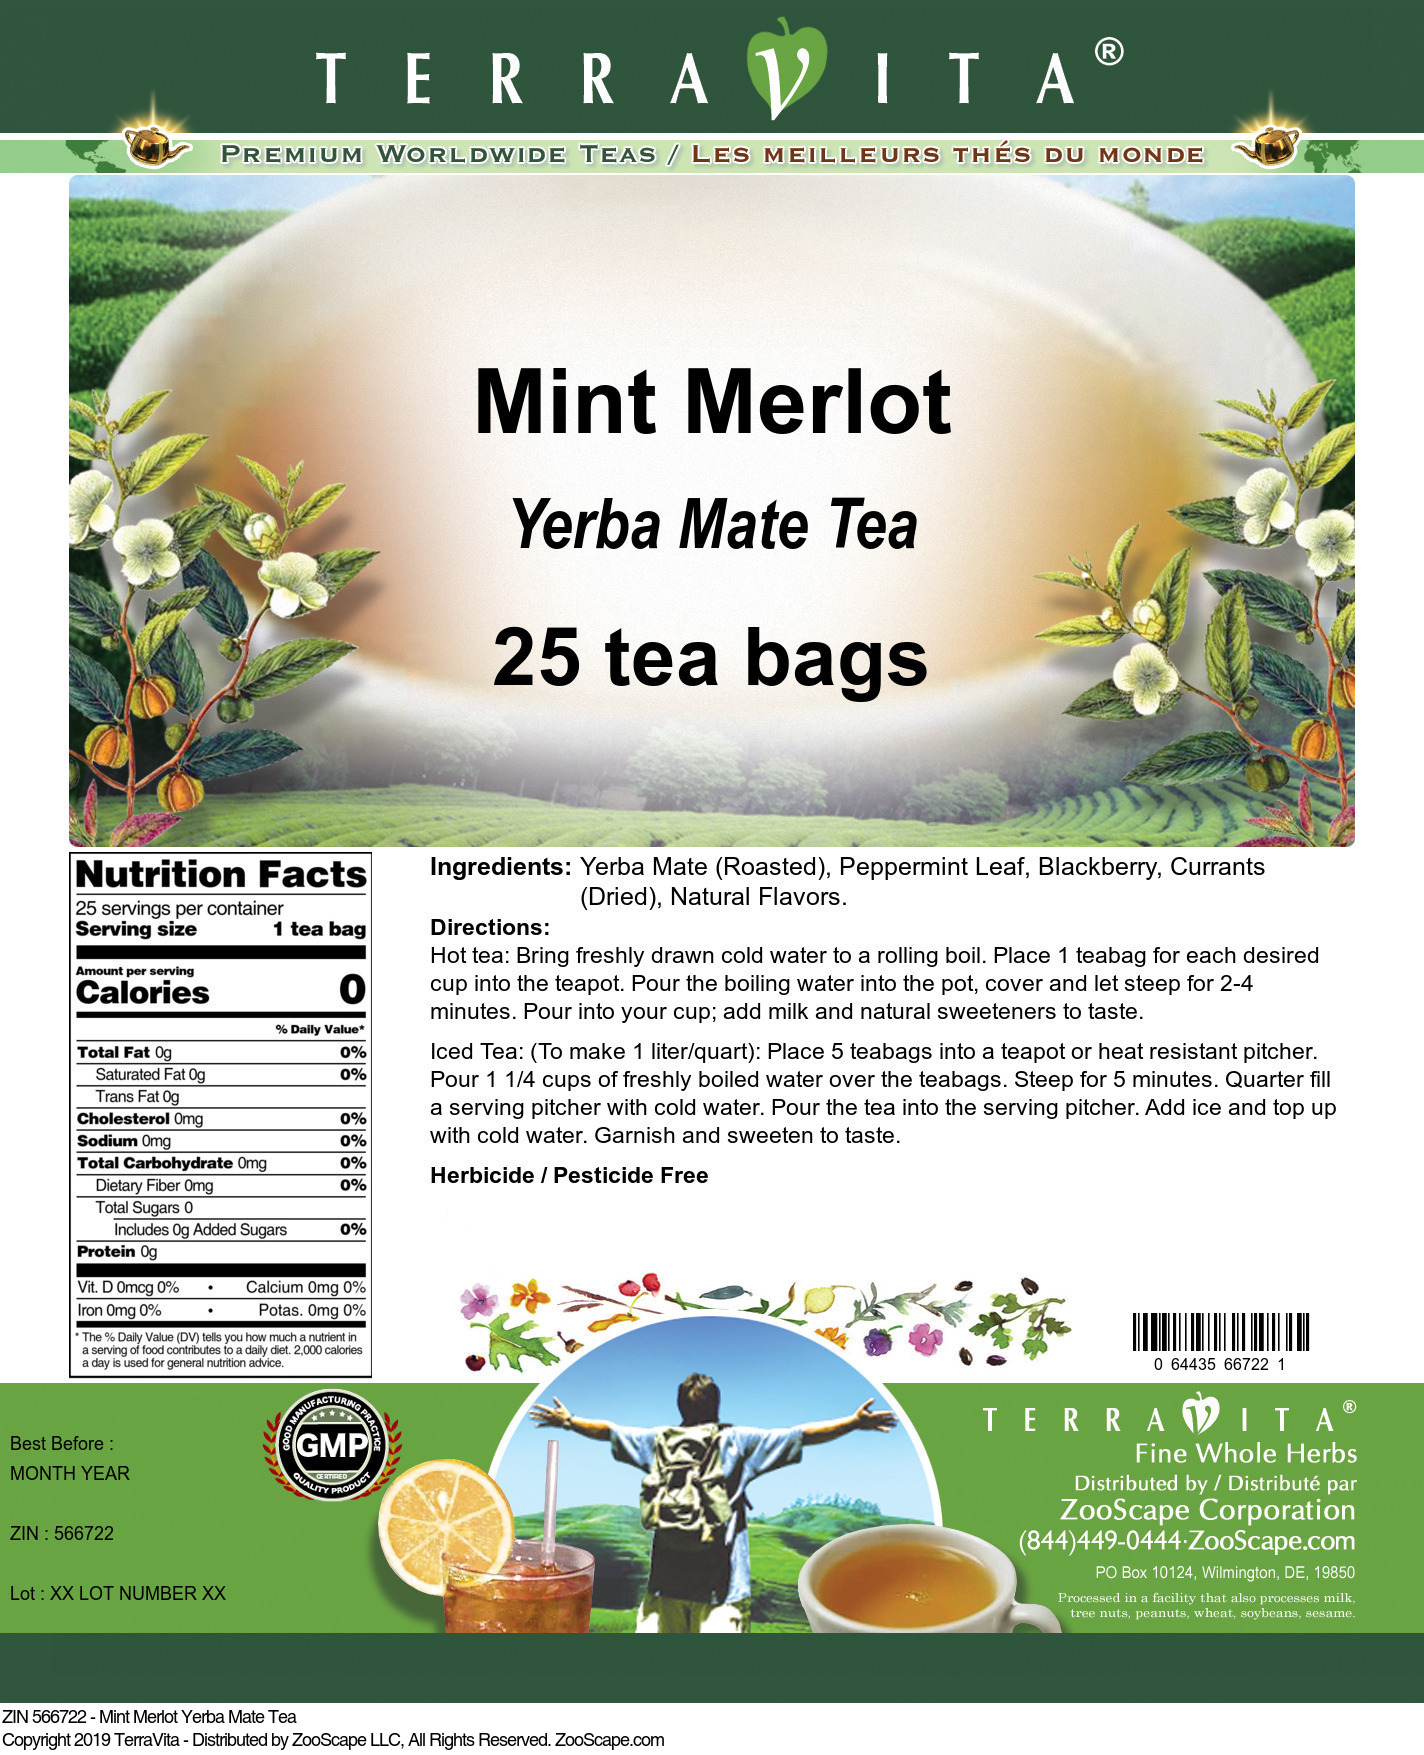 Mint Merlot Yerba Mate Tea